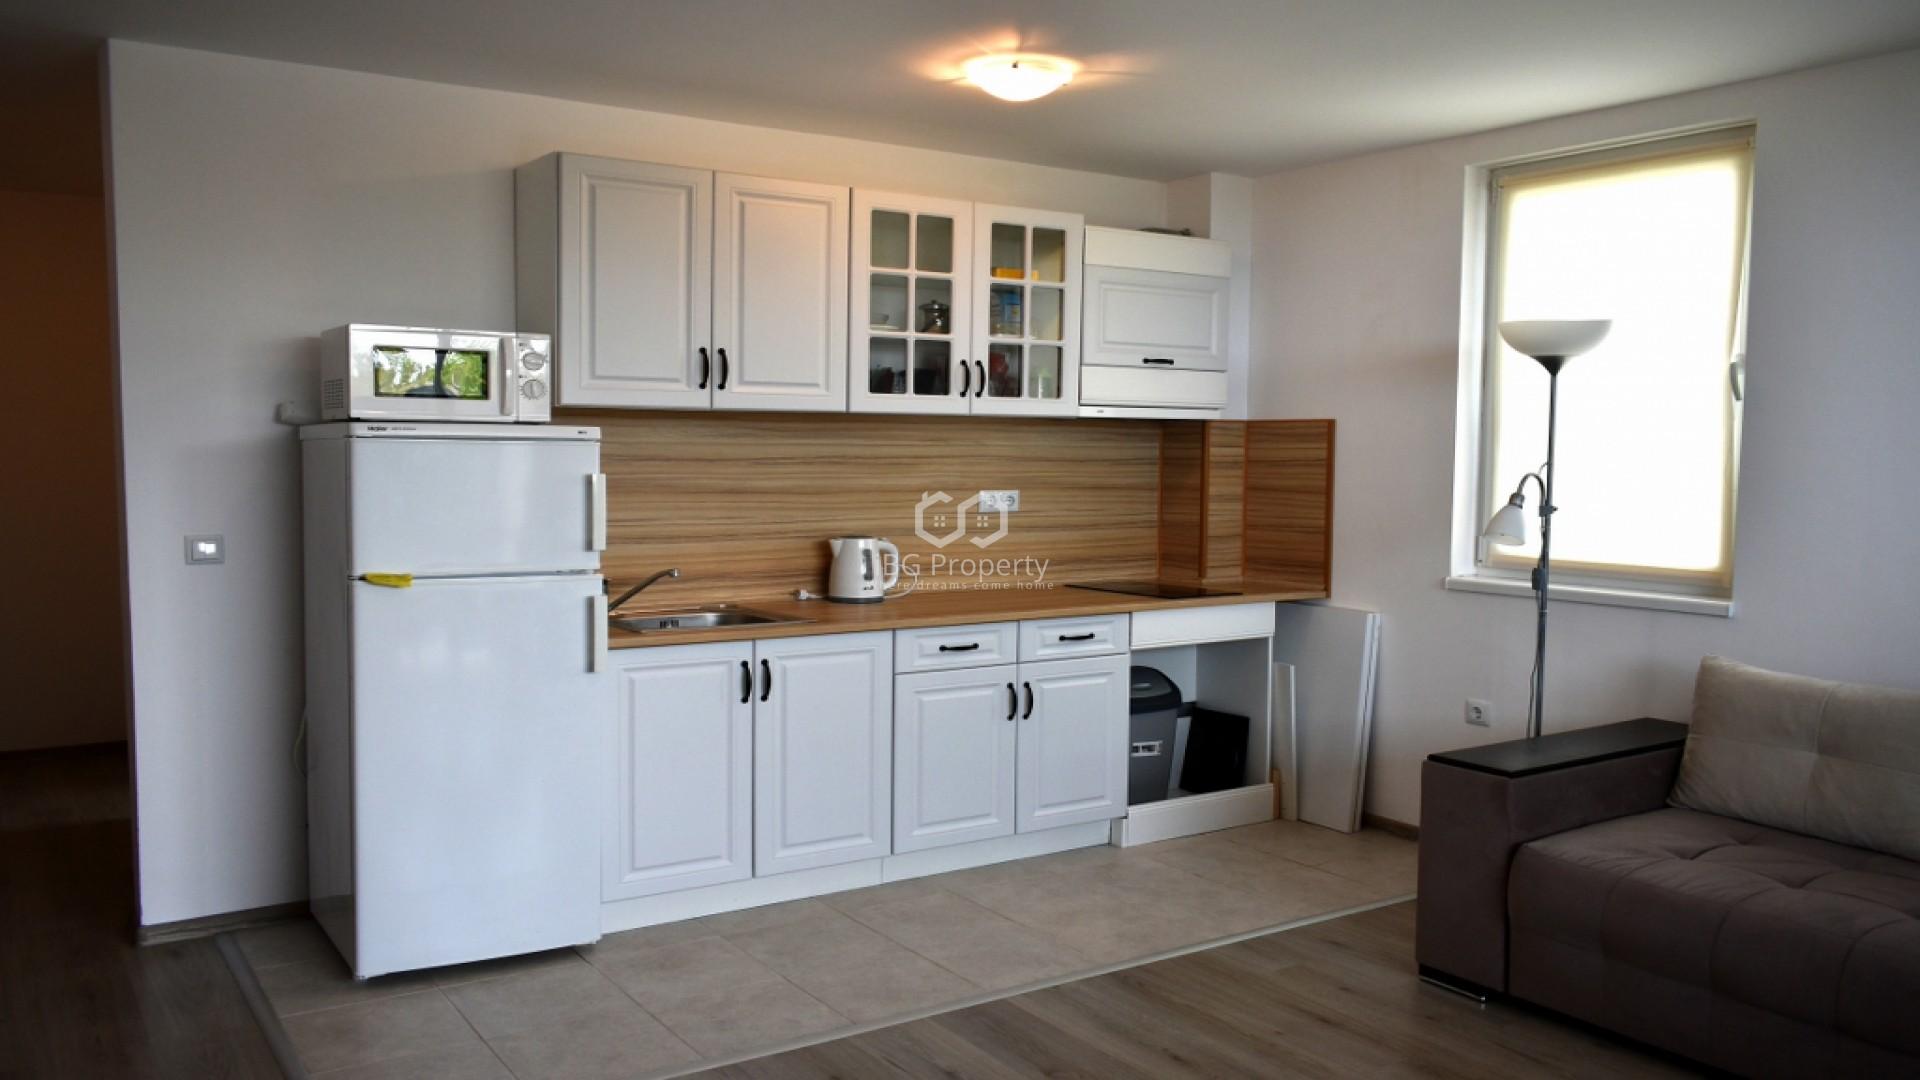 Однокомнатная квартира Бяла  49 m2